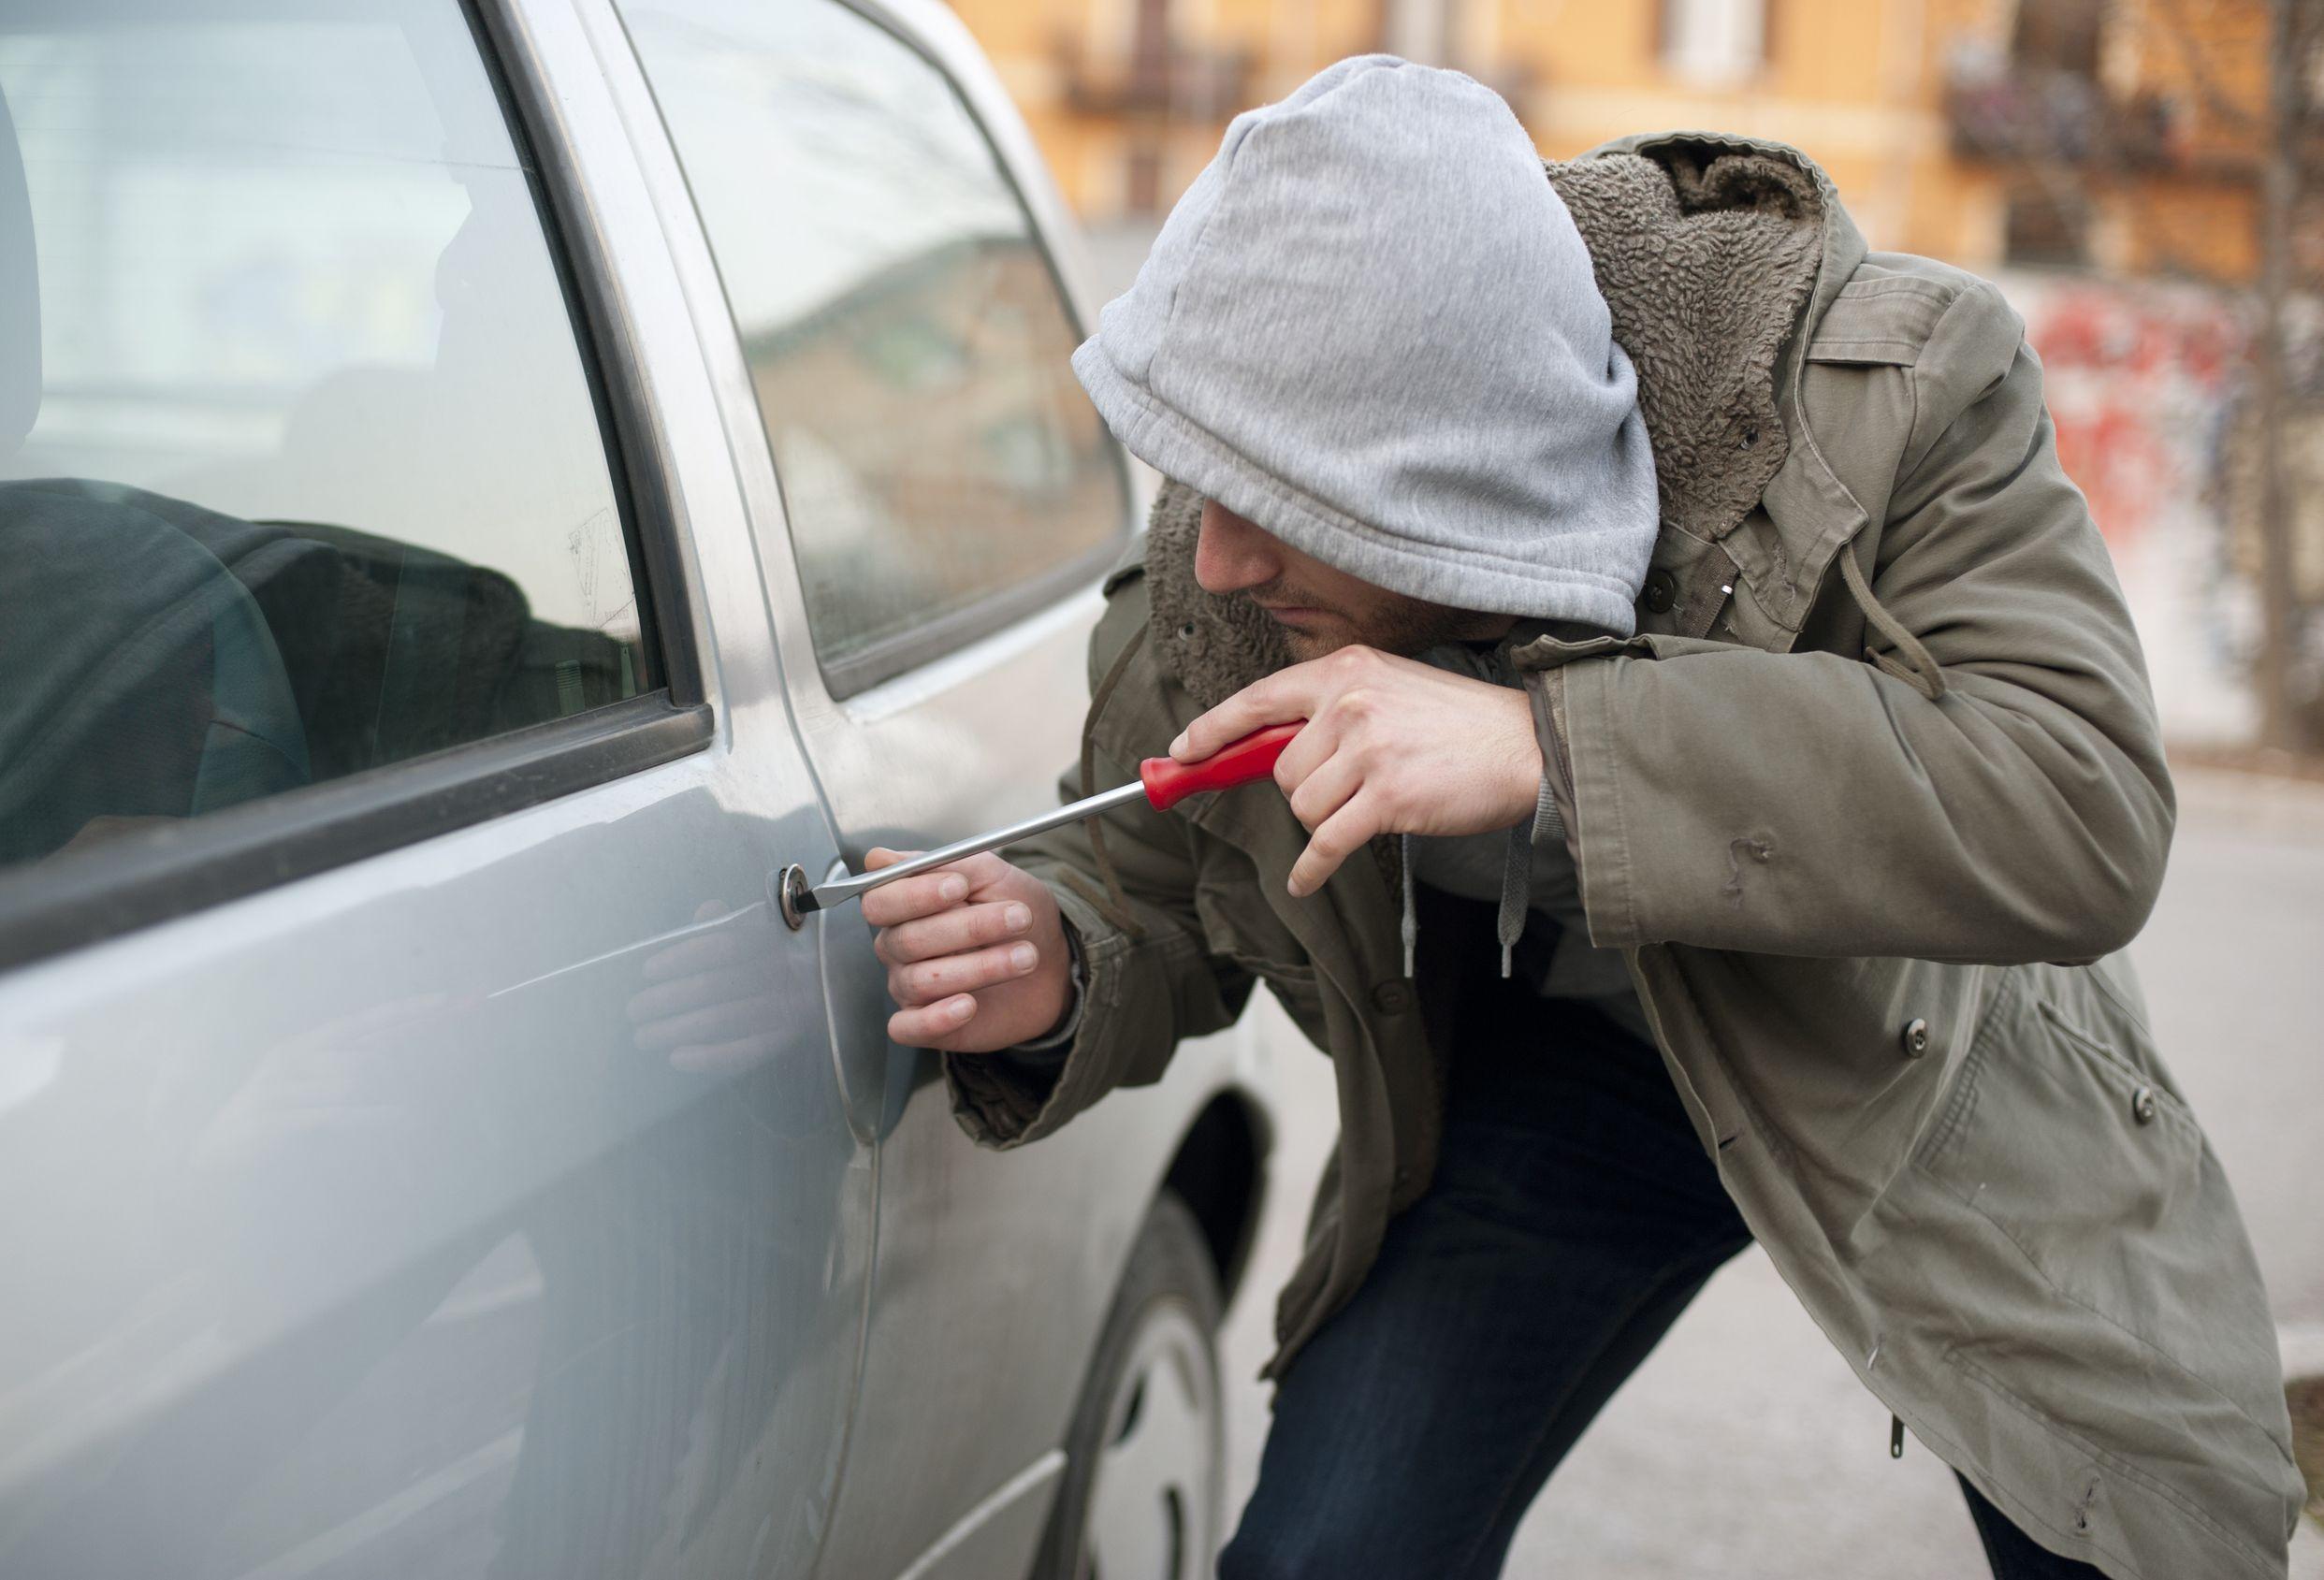 12598477 - car thief in action